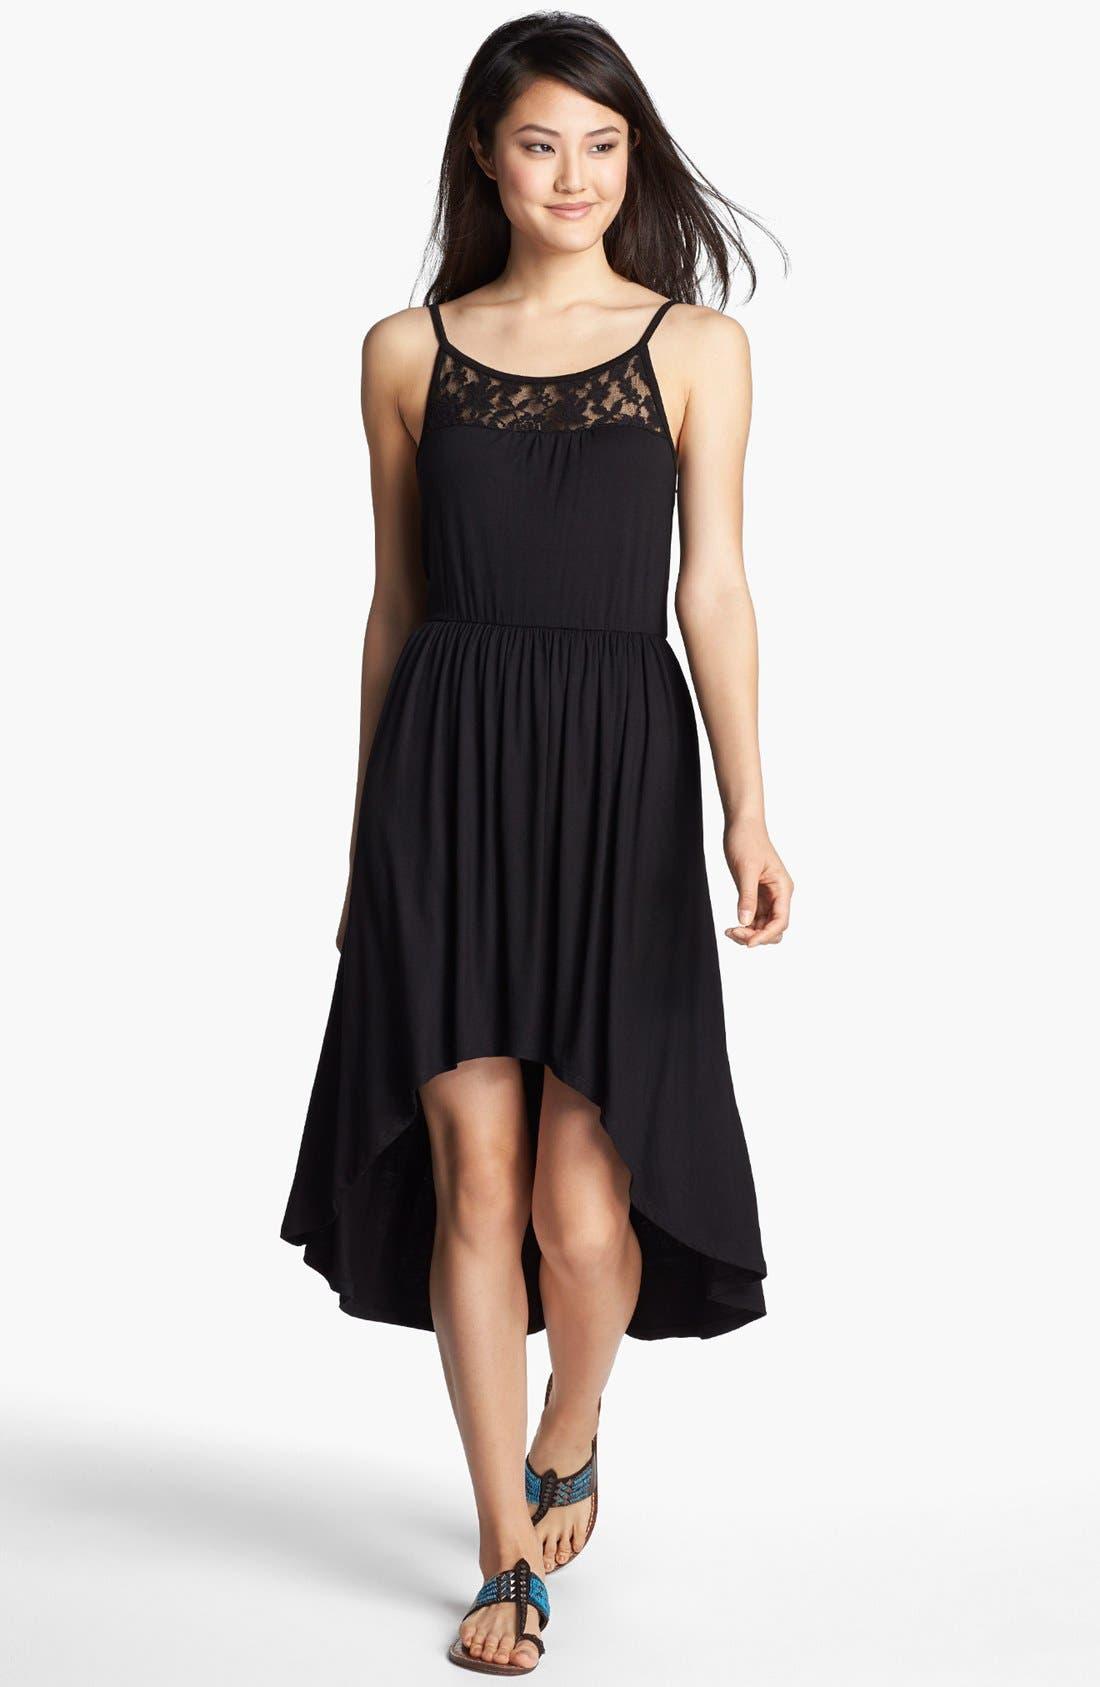 Alternate Image 1 Selected - Loveappella Lace Yoke Dress (Petite)